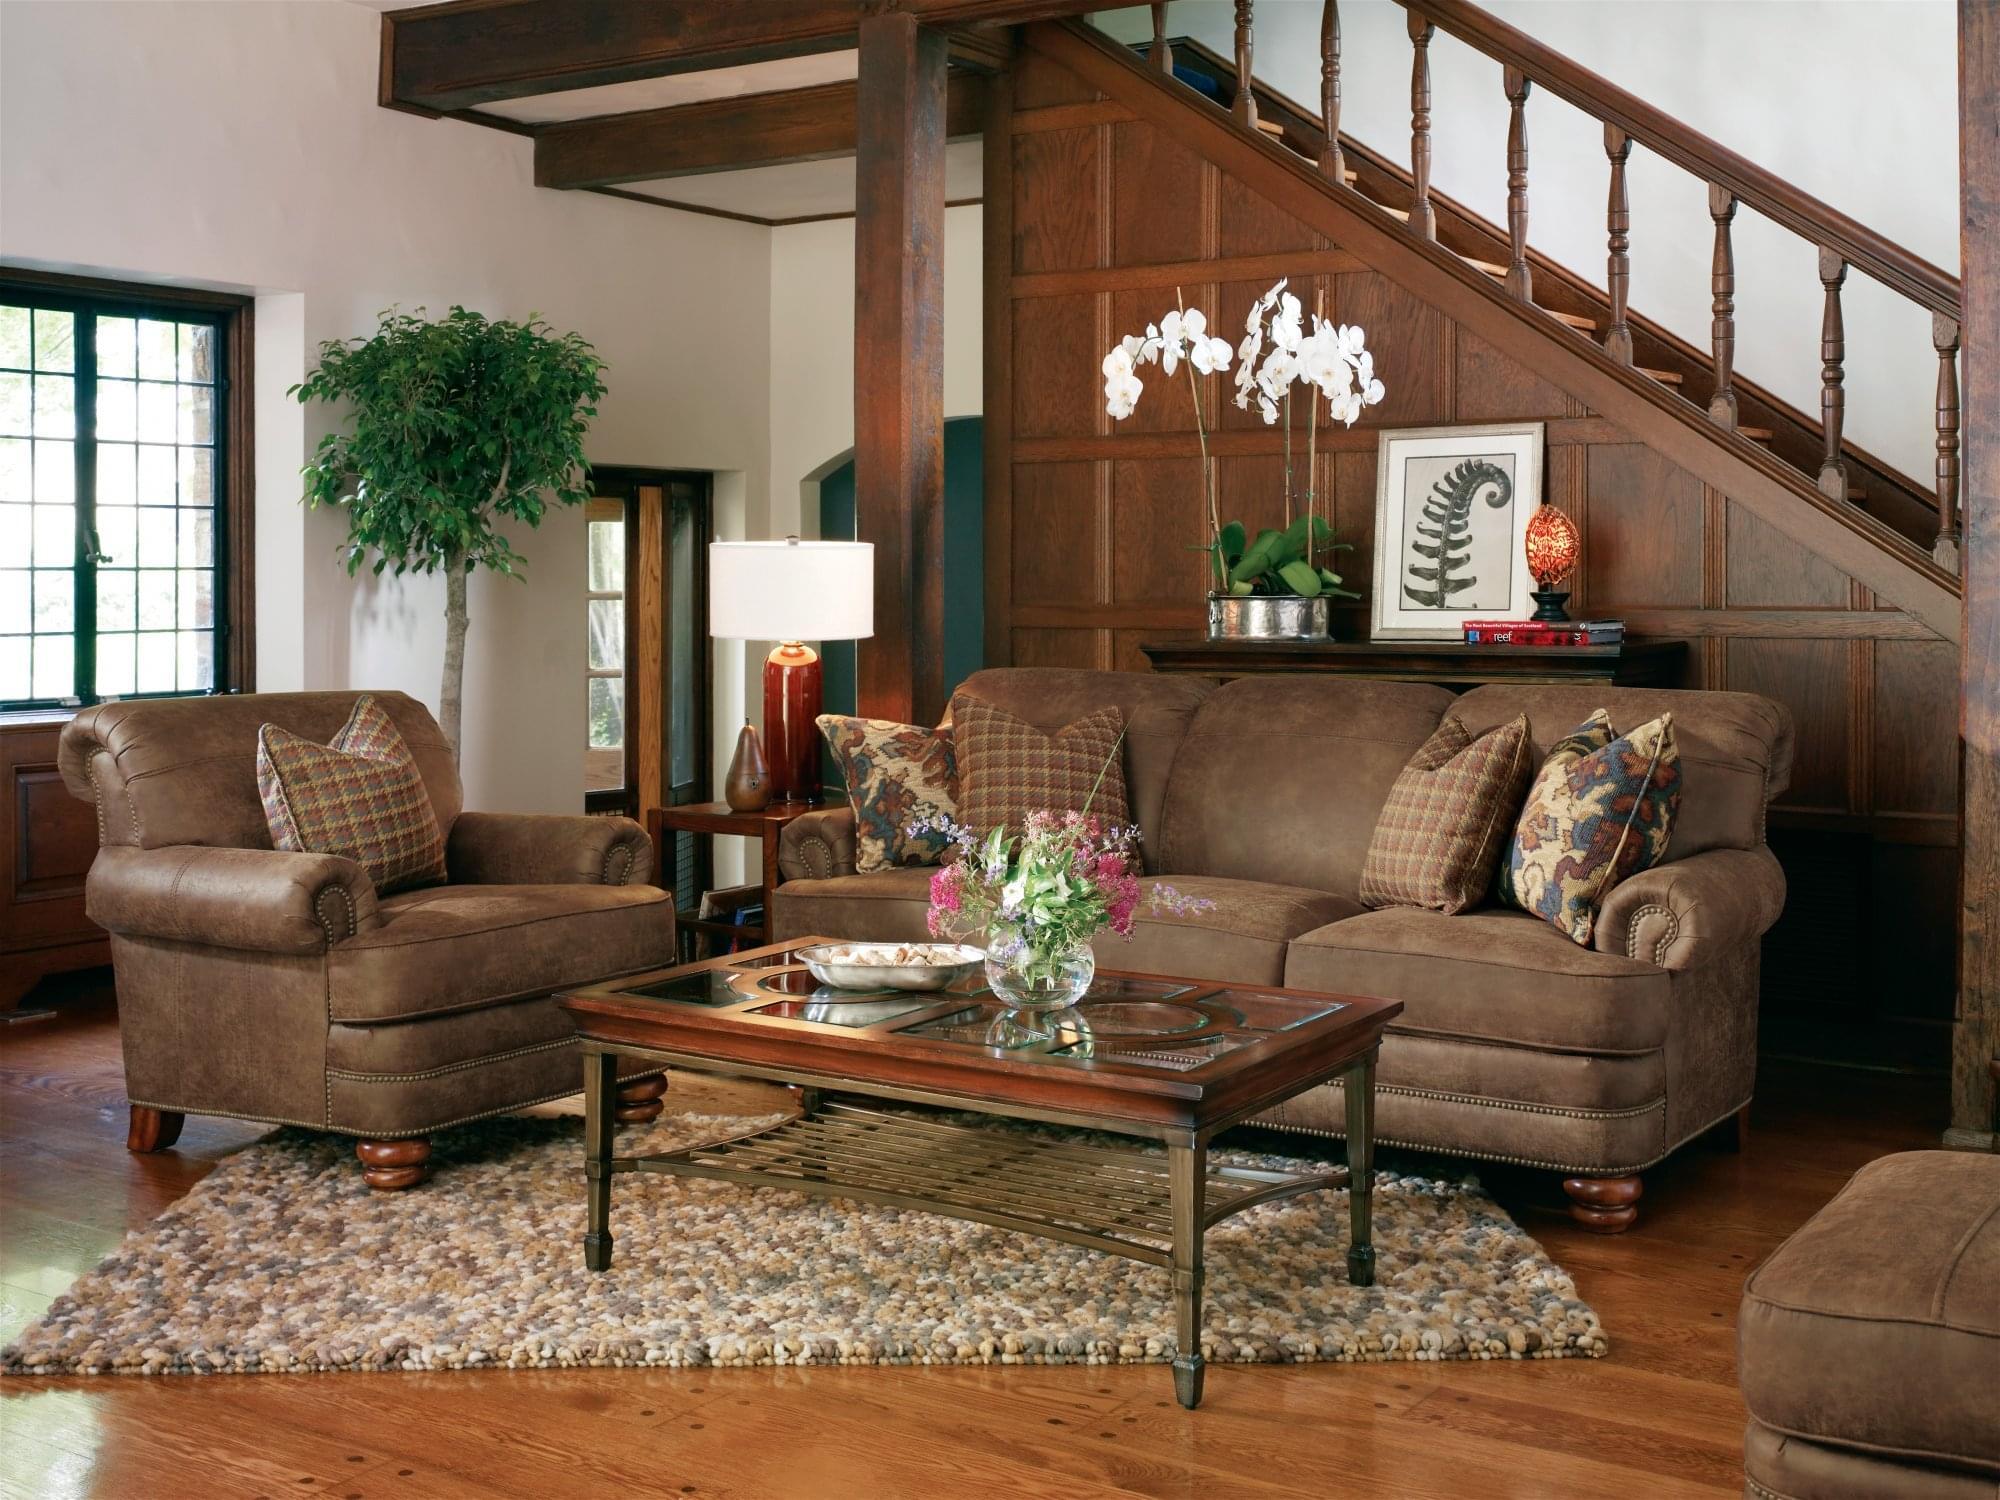 Flexsteel Furniture Bay Bridge Sofa Living Room at Mums Place Furniture Monterey CA